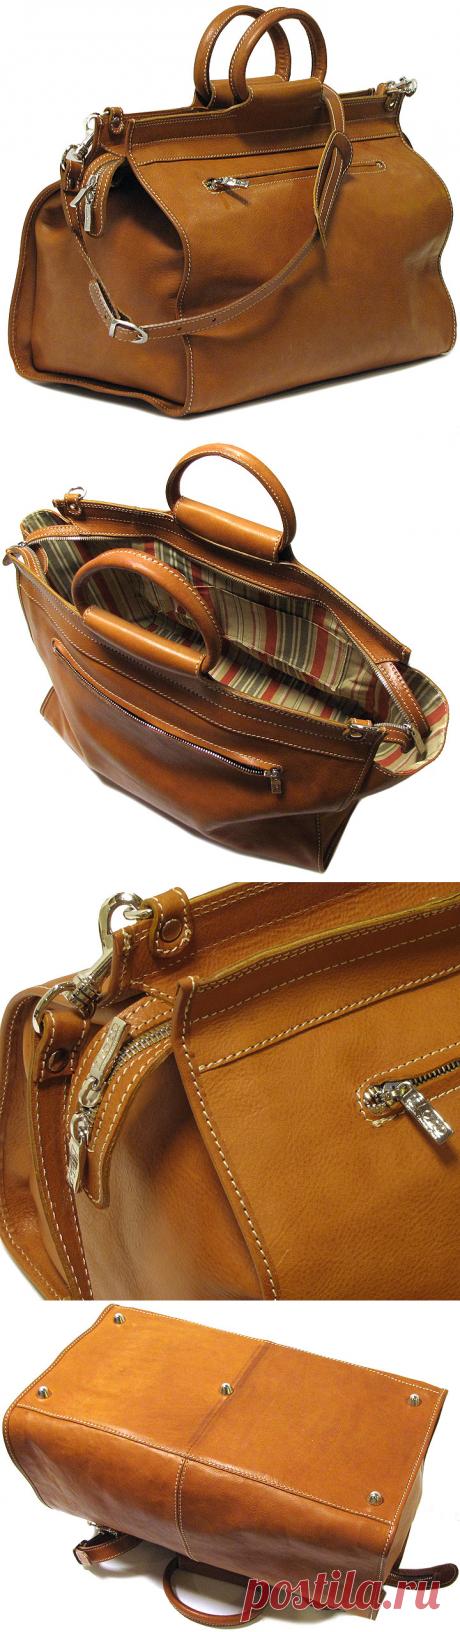 16e80bffadcc Parma Edition Traveler Italian Bags - Fenzo Italian Bags